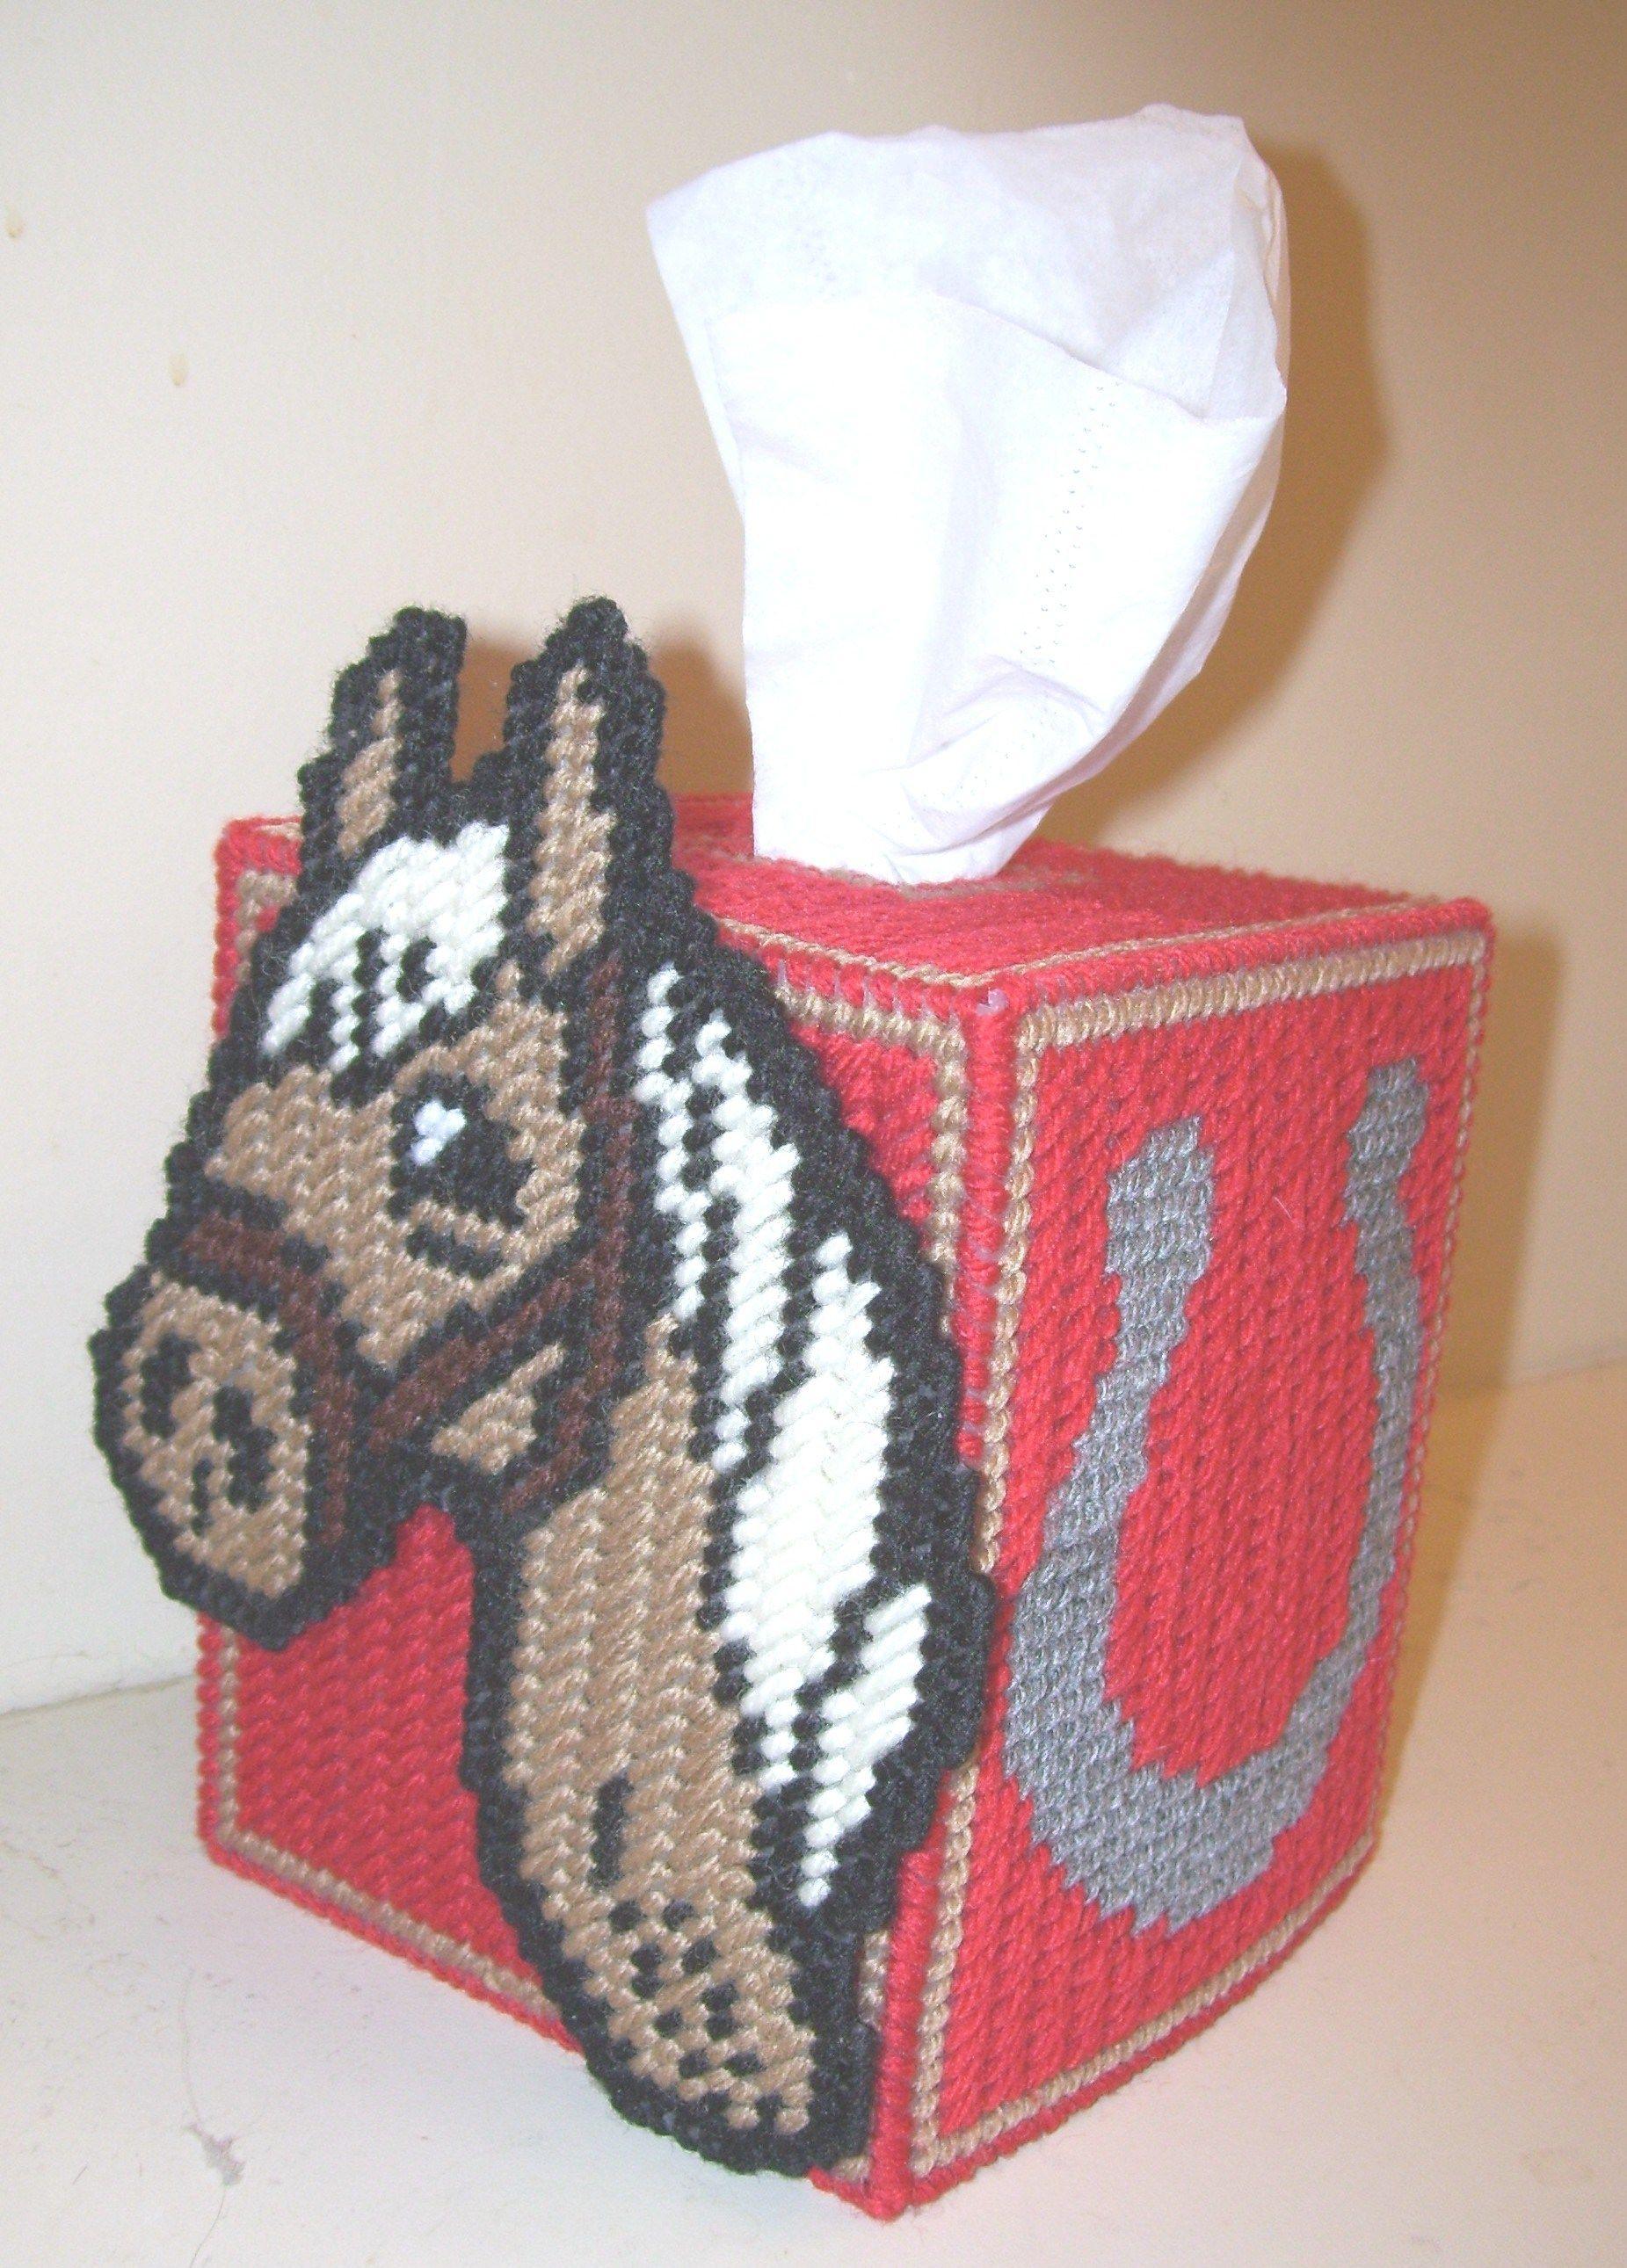 Free Plastic Canvas Tissue Box Patterns. Tissue Box Cover Fits - Free Printable Plastic Canvas Tissue Box Patterns